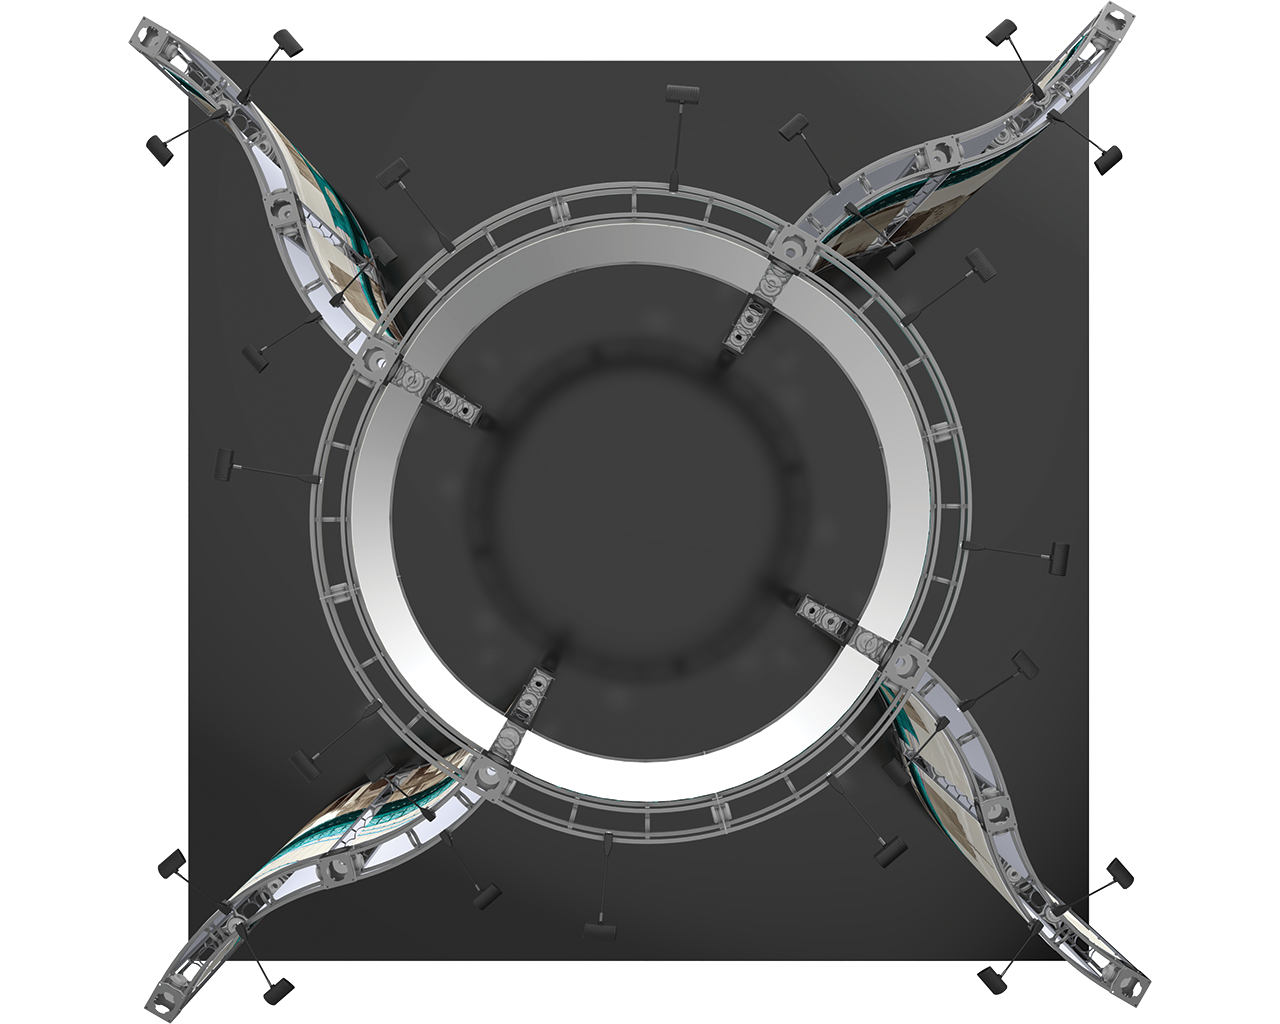 Canis 20 x 20 Orbital Truss